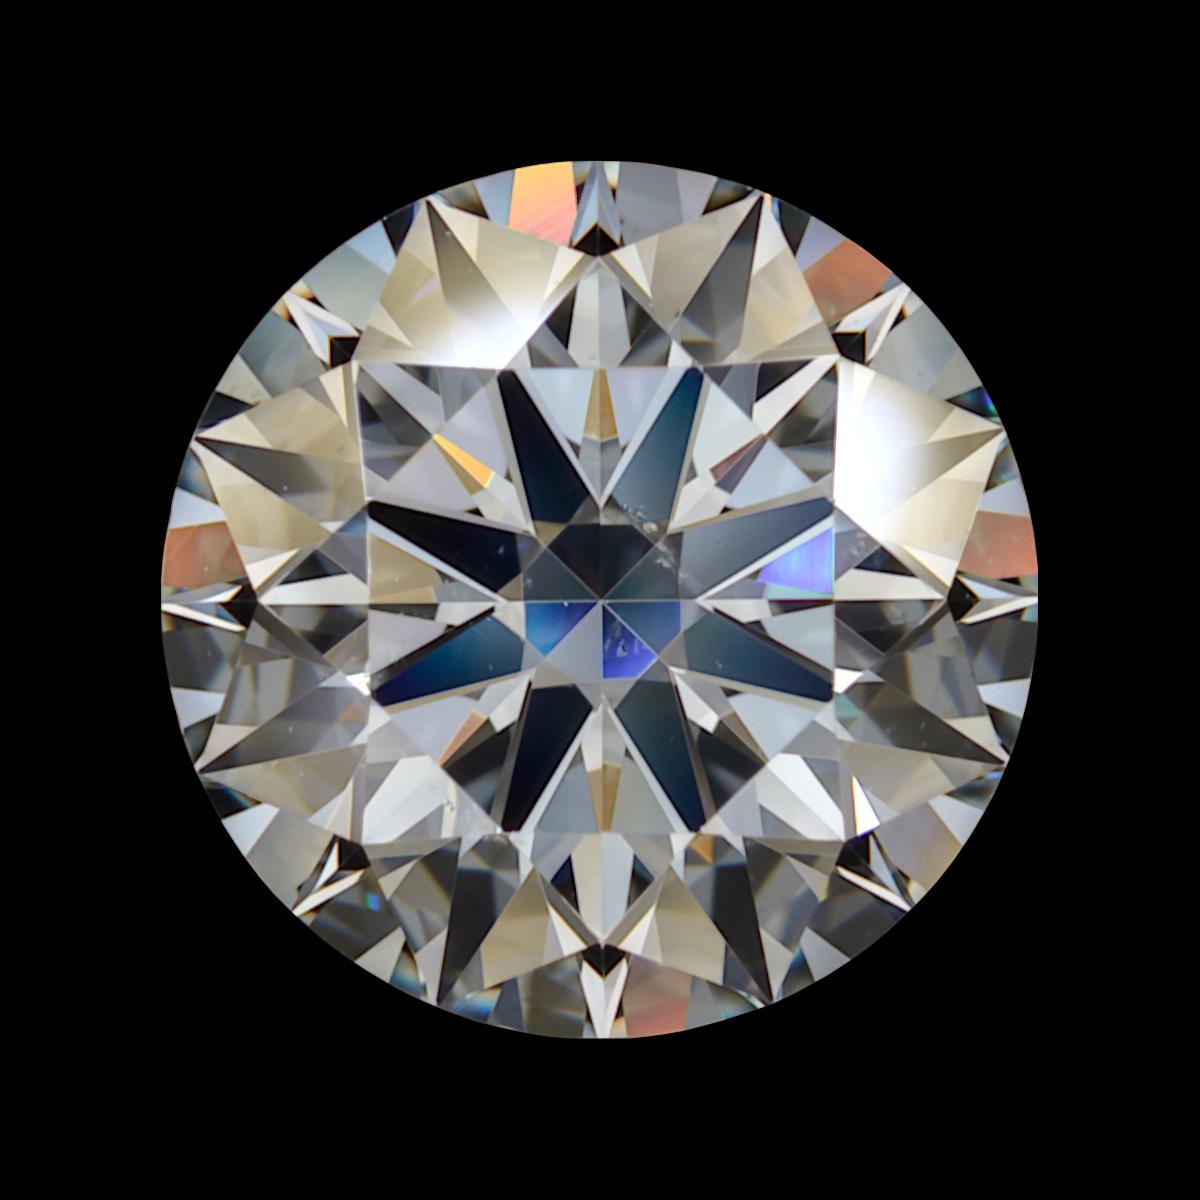 https://cdn.briangavindiamonds.com/files/mp4/BLAGS-104073209004/BLAGS-104073209004-Office-02.mp4